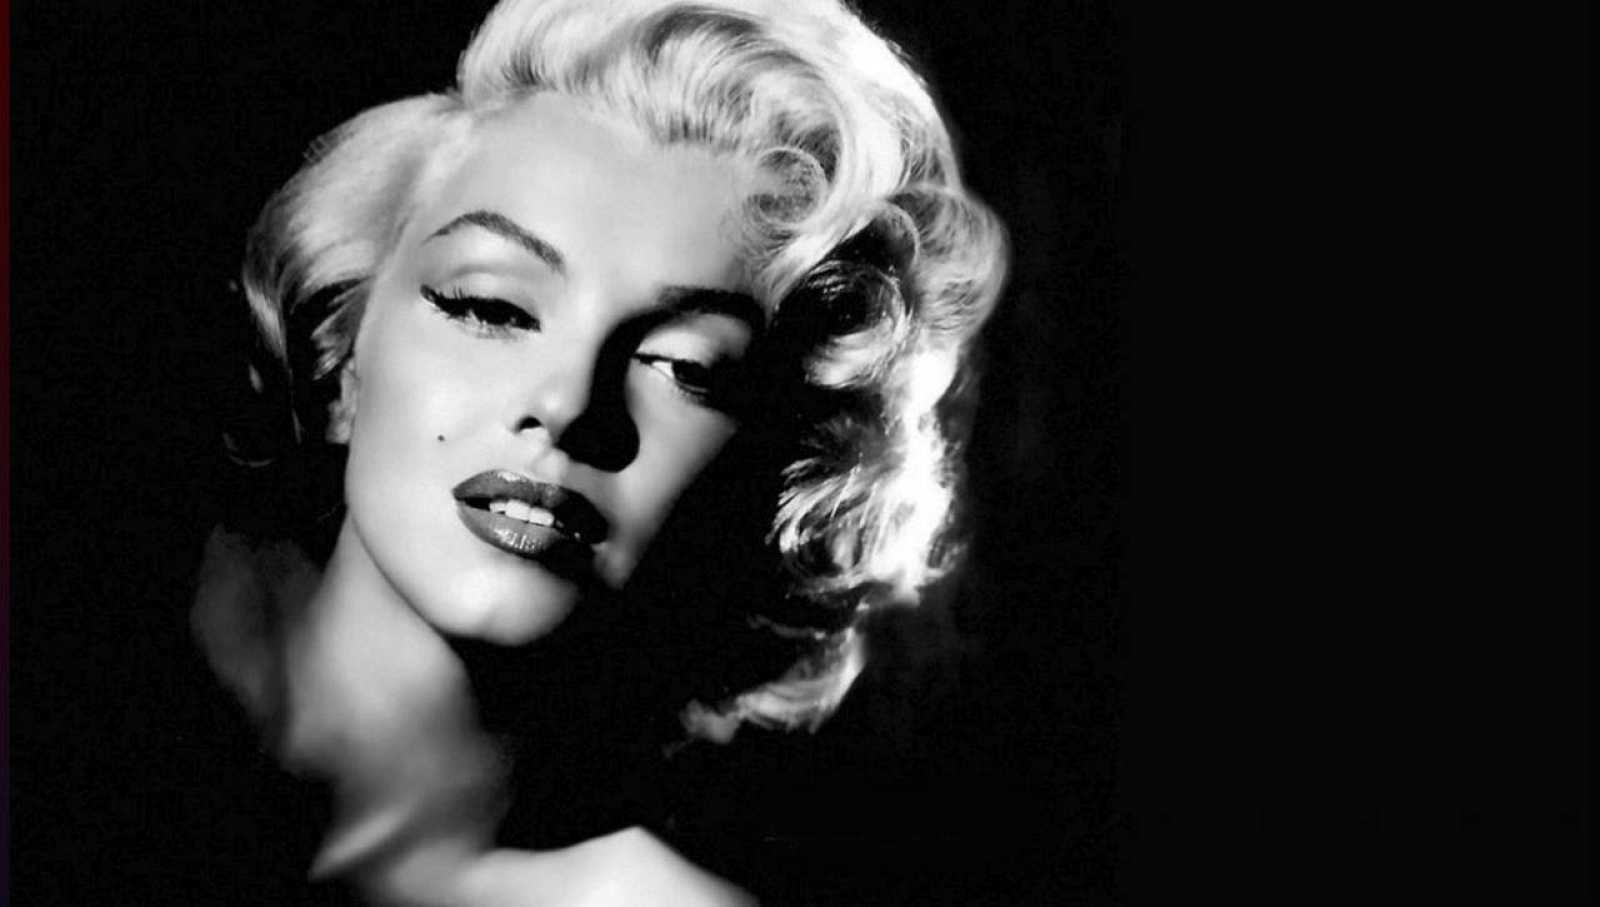 Norma Jean Baker, Marilyn Monroe, falleció en 1962